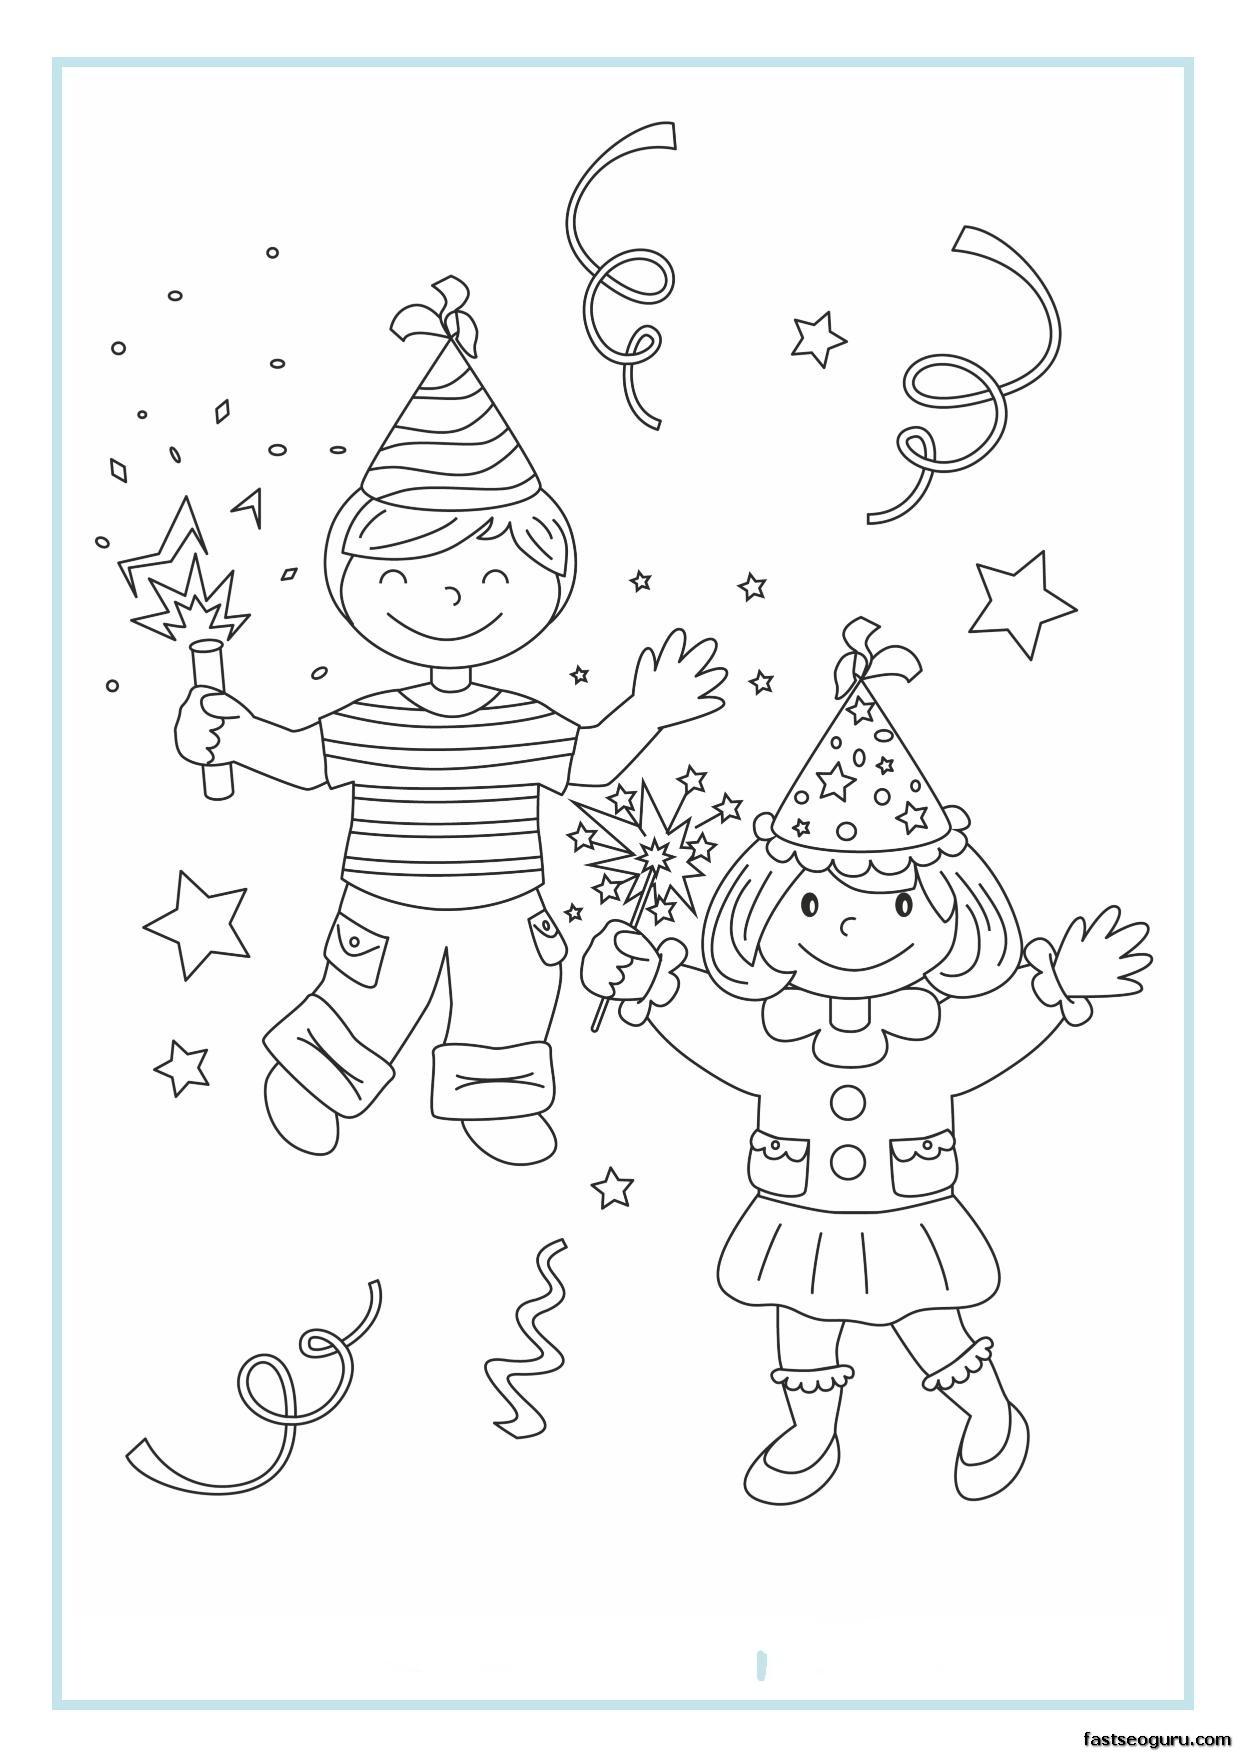 Printable new year coloring sheet